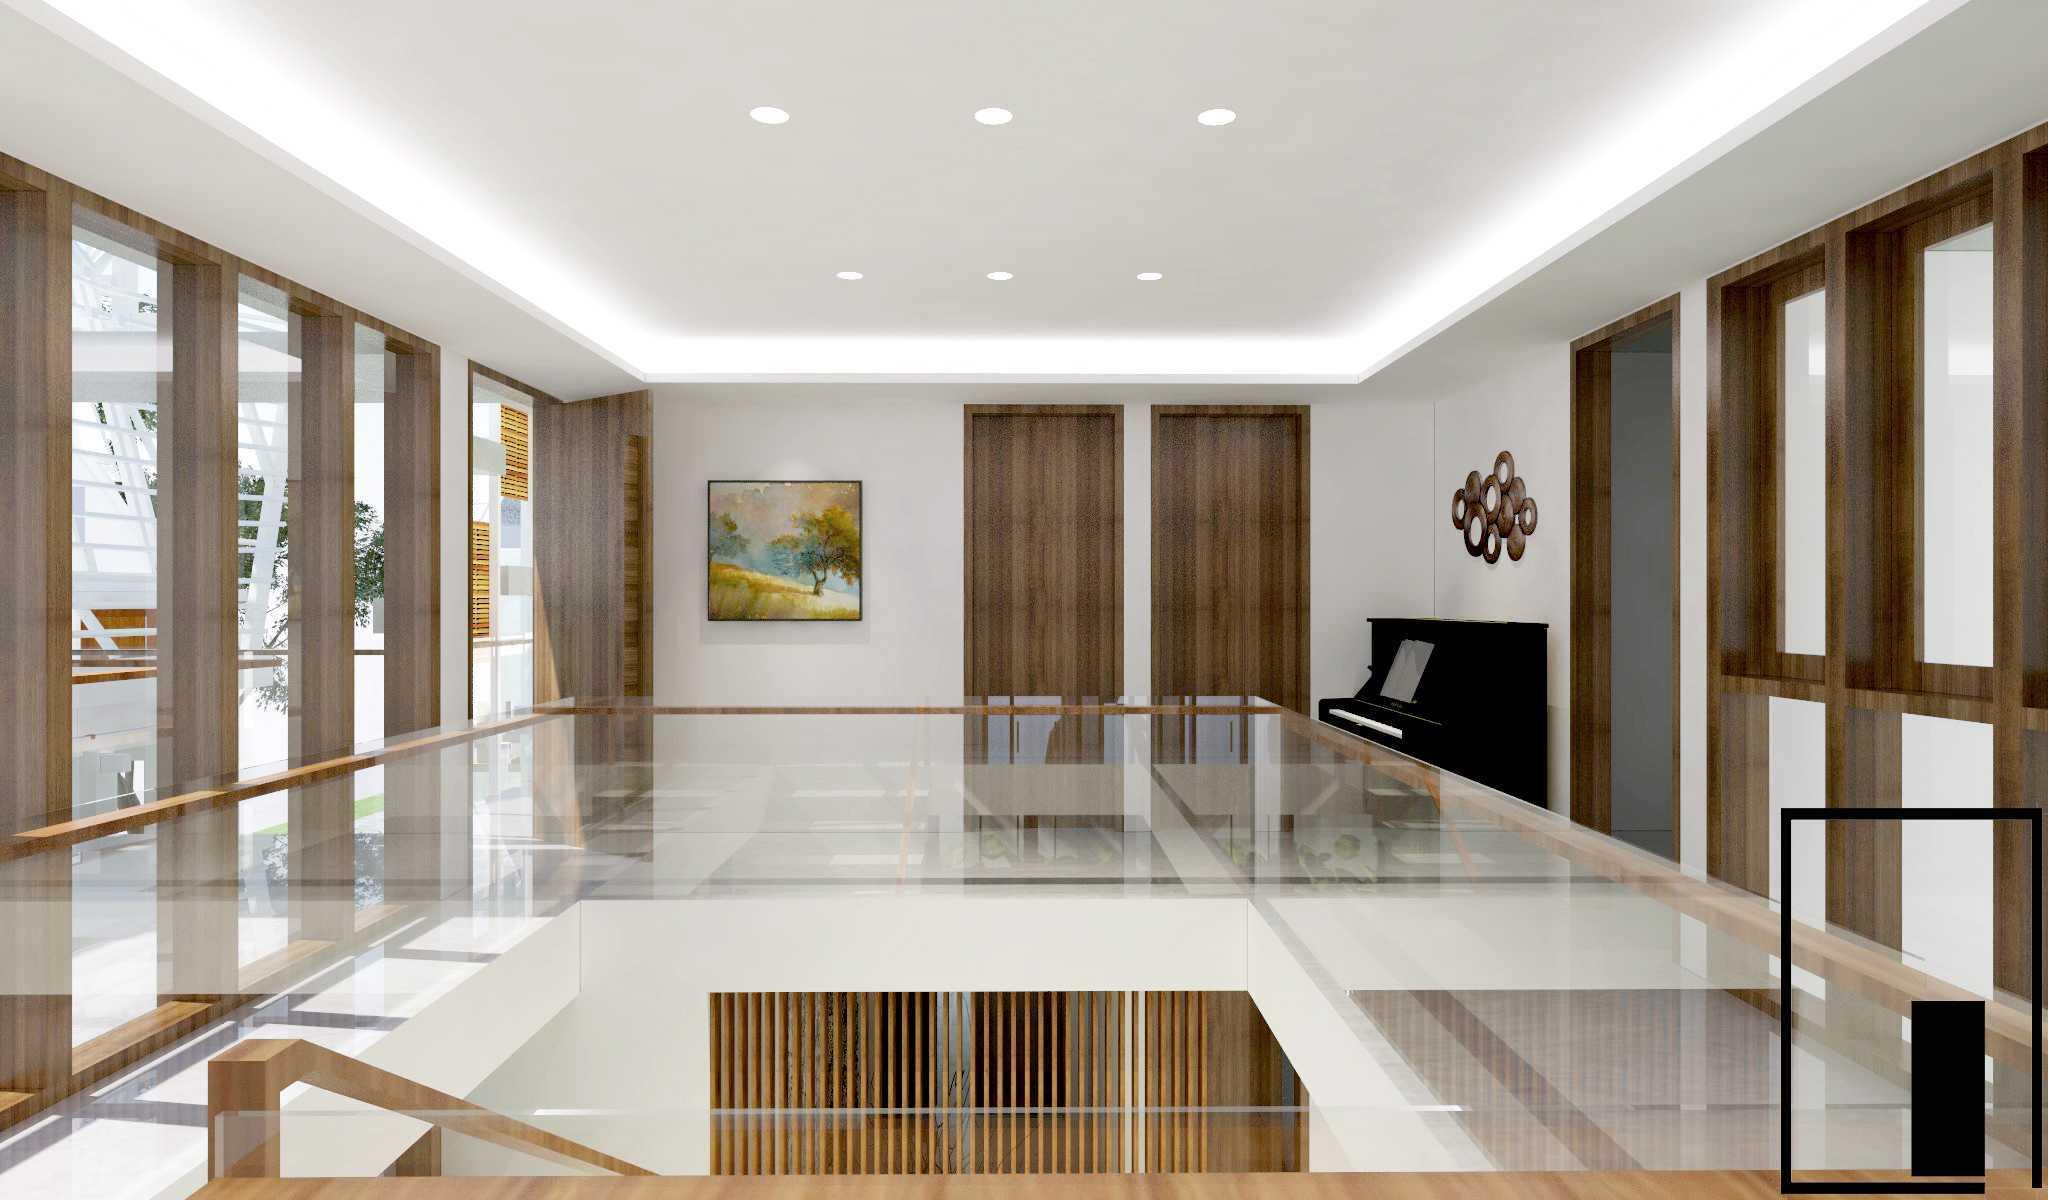 Guntur Haryadi Architecture Studio Tr Villa Nana' Nanggala, Nanggala, Kabupaten Toraja Utara, Sulawesi Selatan, Indonesia  Guntur-Haryadi-Architecture-Studio-Tr-Villa   53581